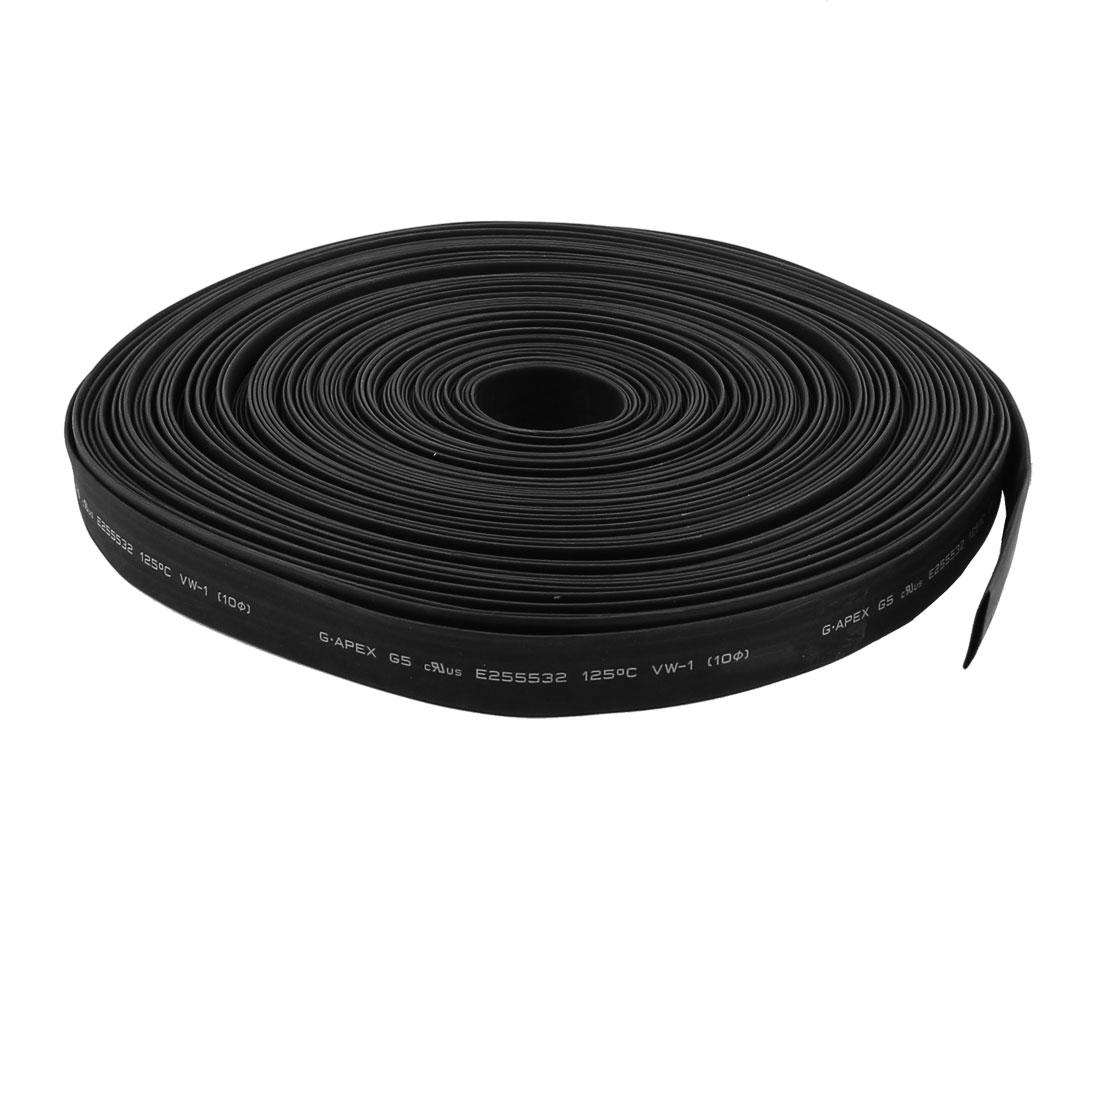 30m 10mm Dia Insulated Heat Shrink Tubing 2:1 Shrinkage Ratio Waterproof Black